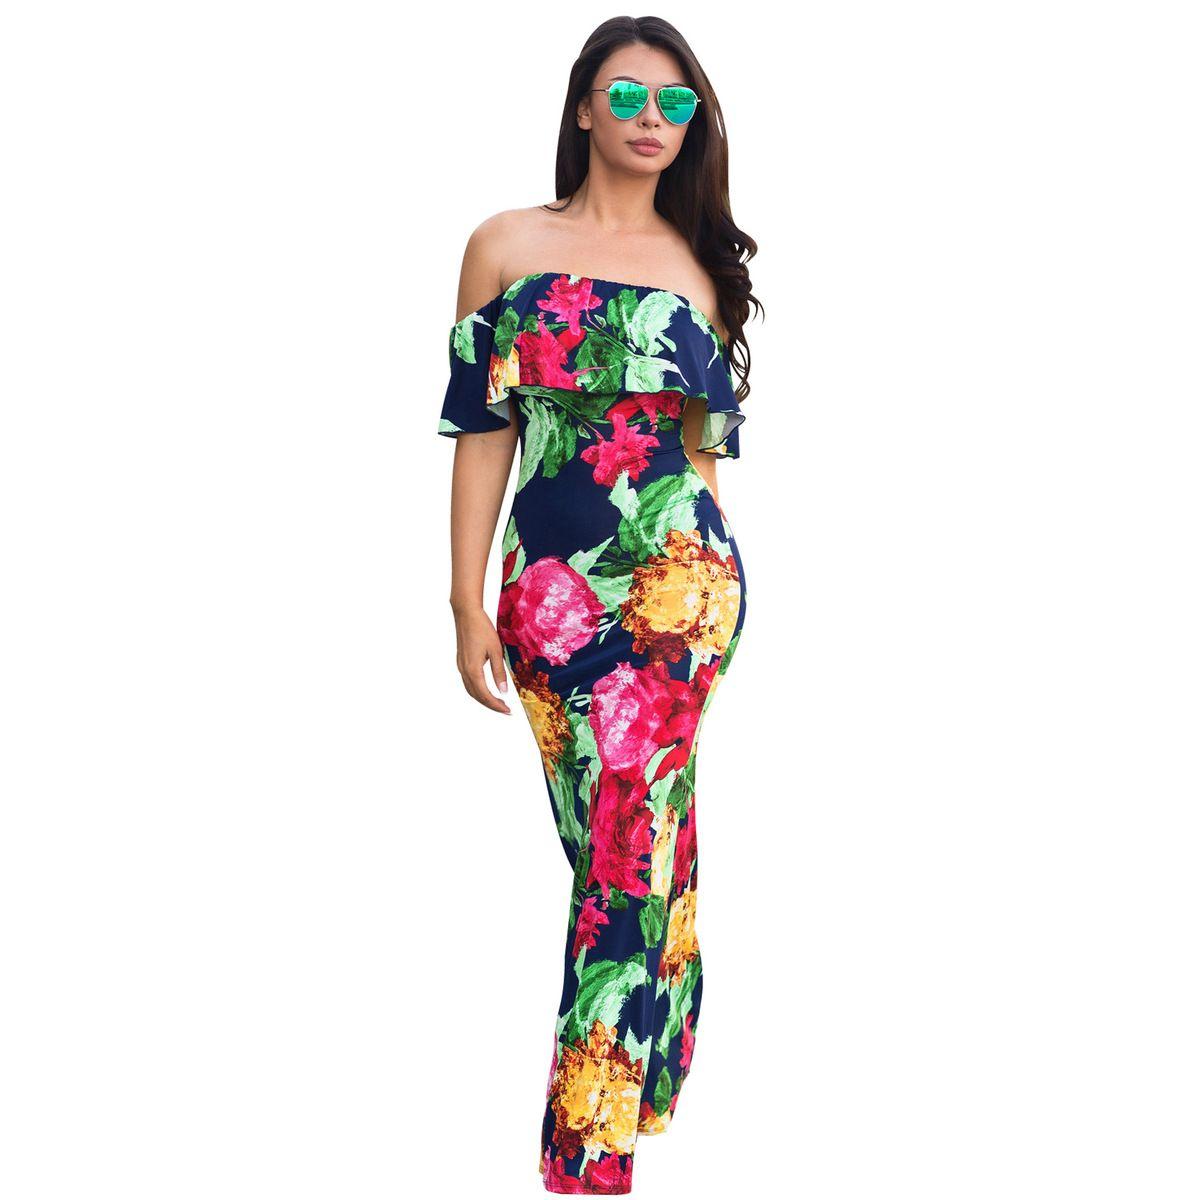 17f515562e133 Ladies Summer Ruffles Evening Party Long Maxi Dress Women Floral Print Off  Shoulder Boho Dress Off The Shoulder Summer Dress Floral Dress Online From  ...